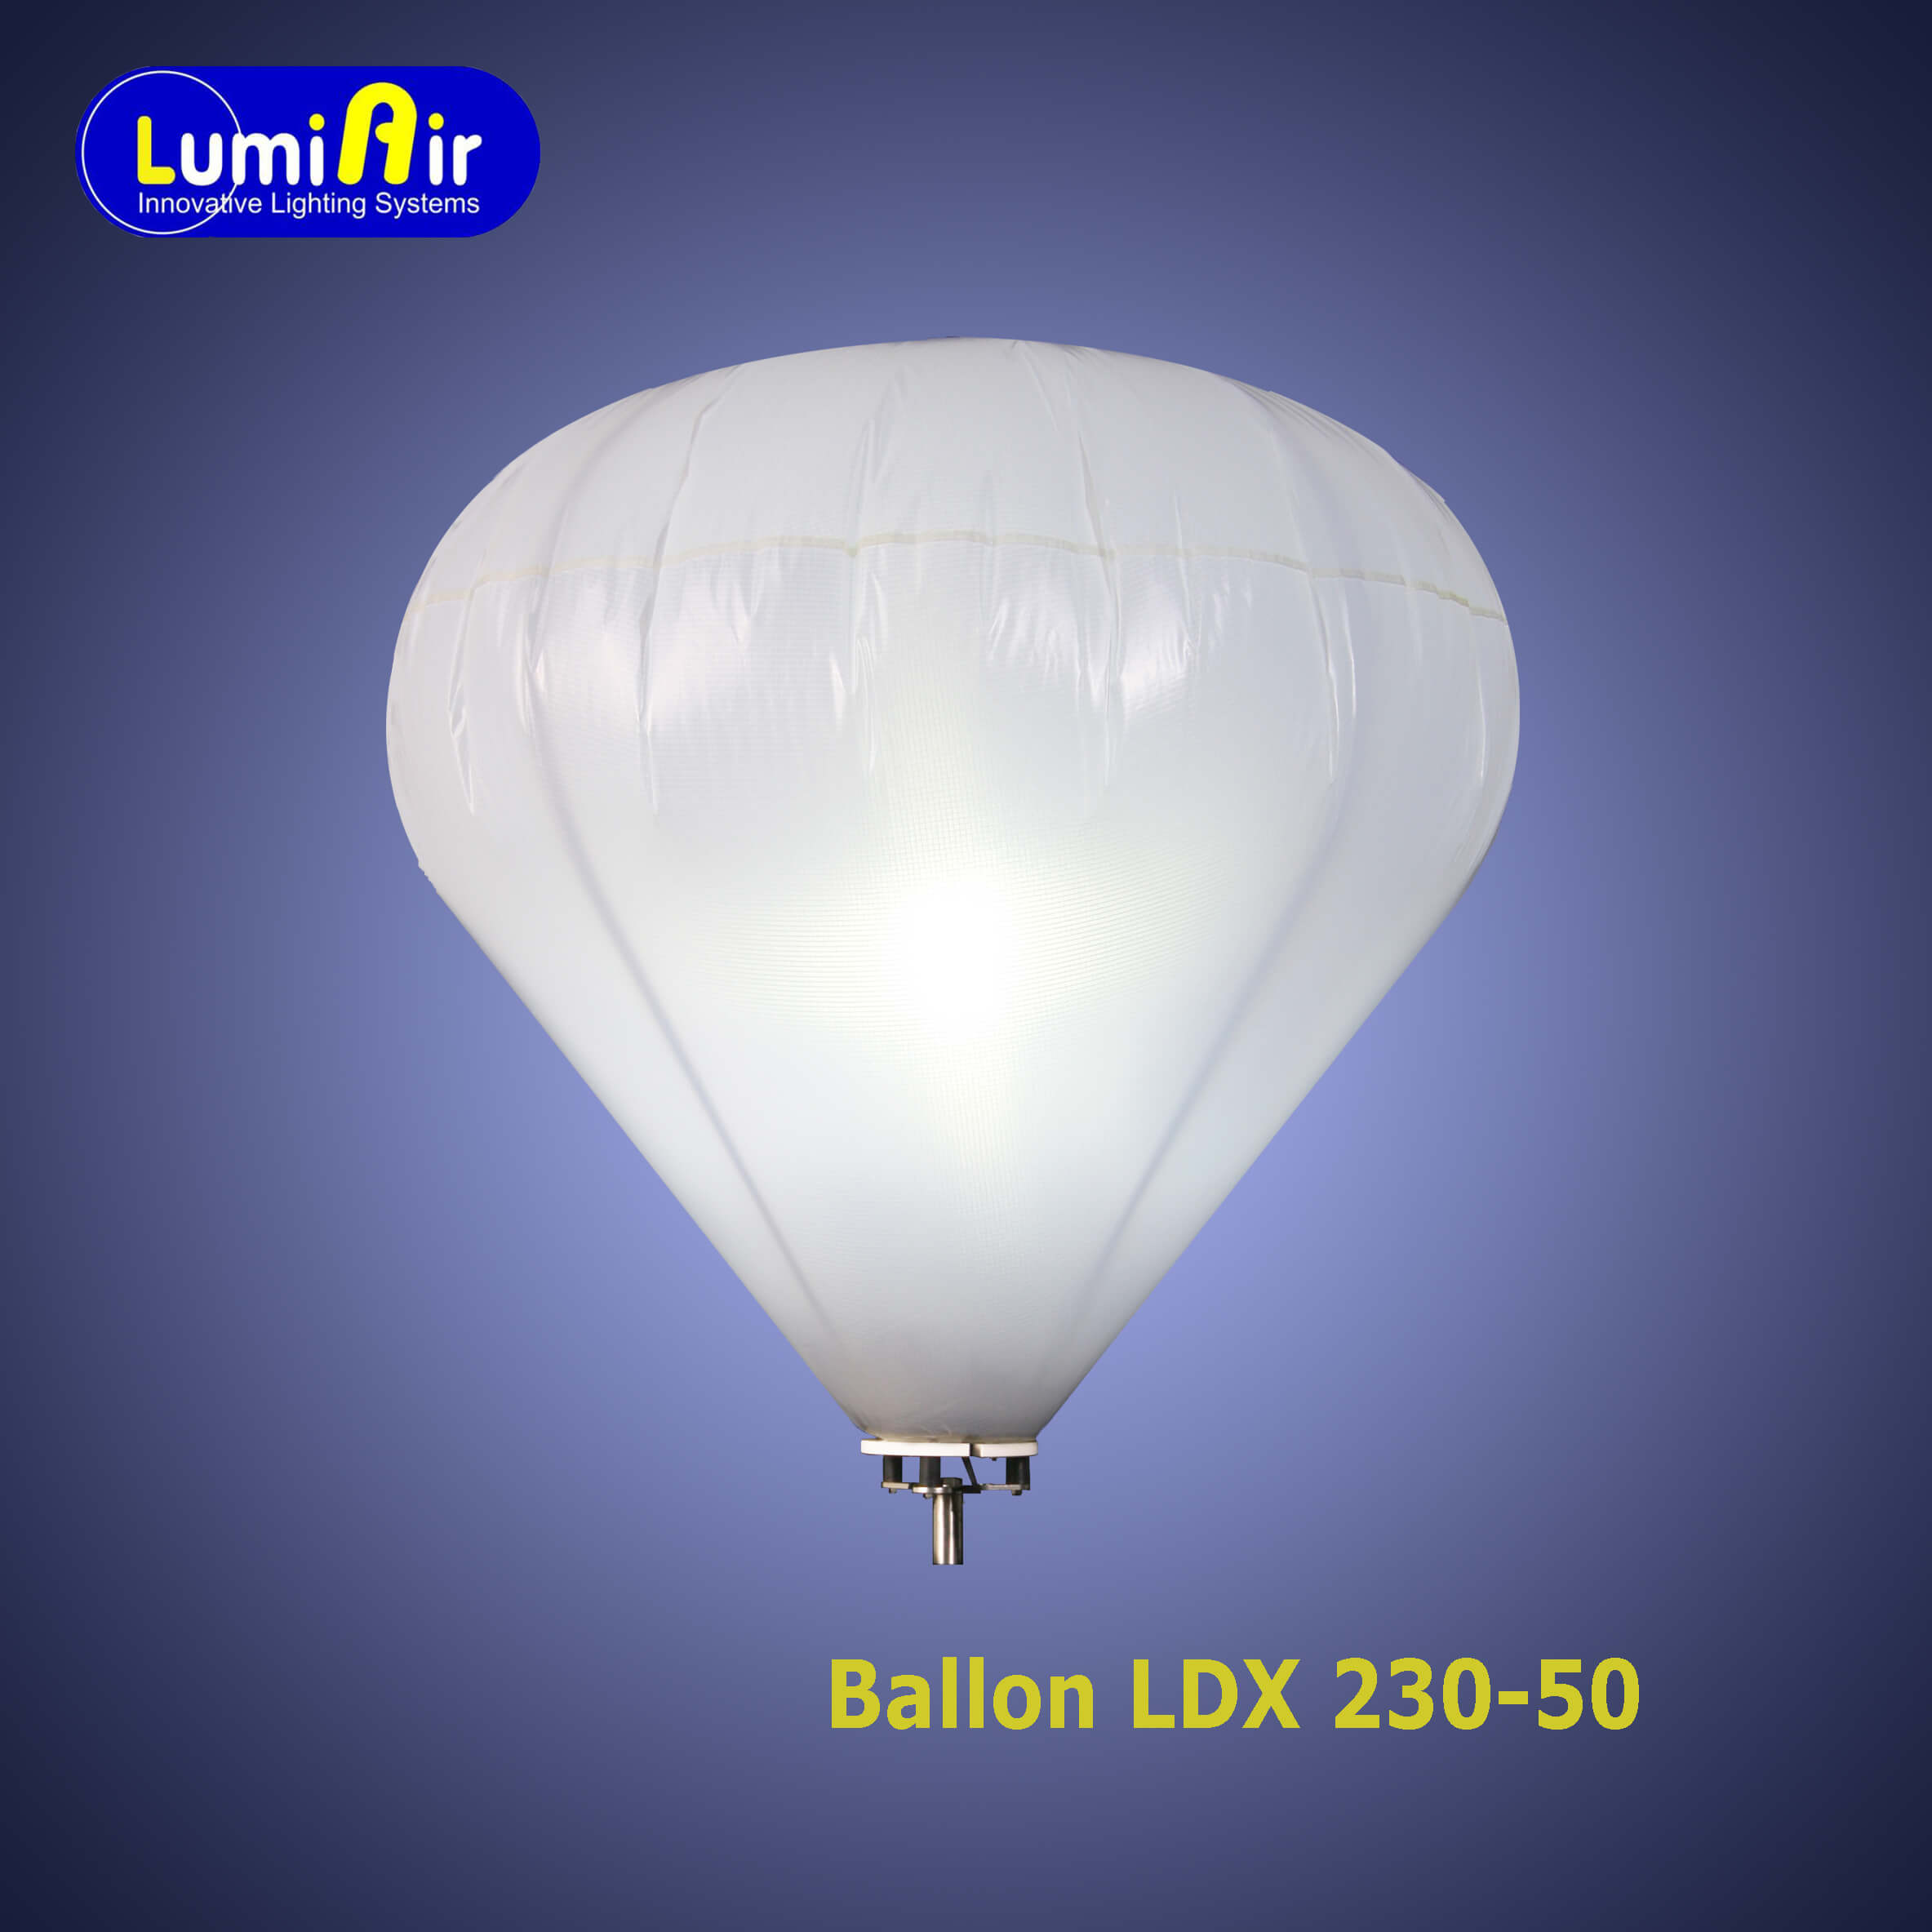 LDX 230-50